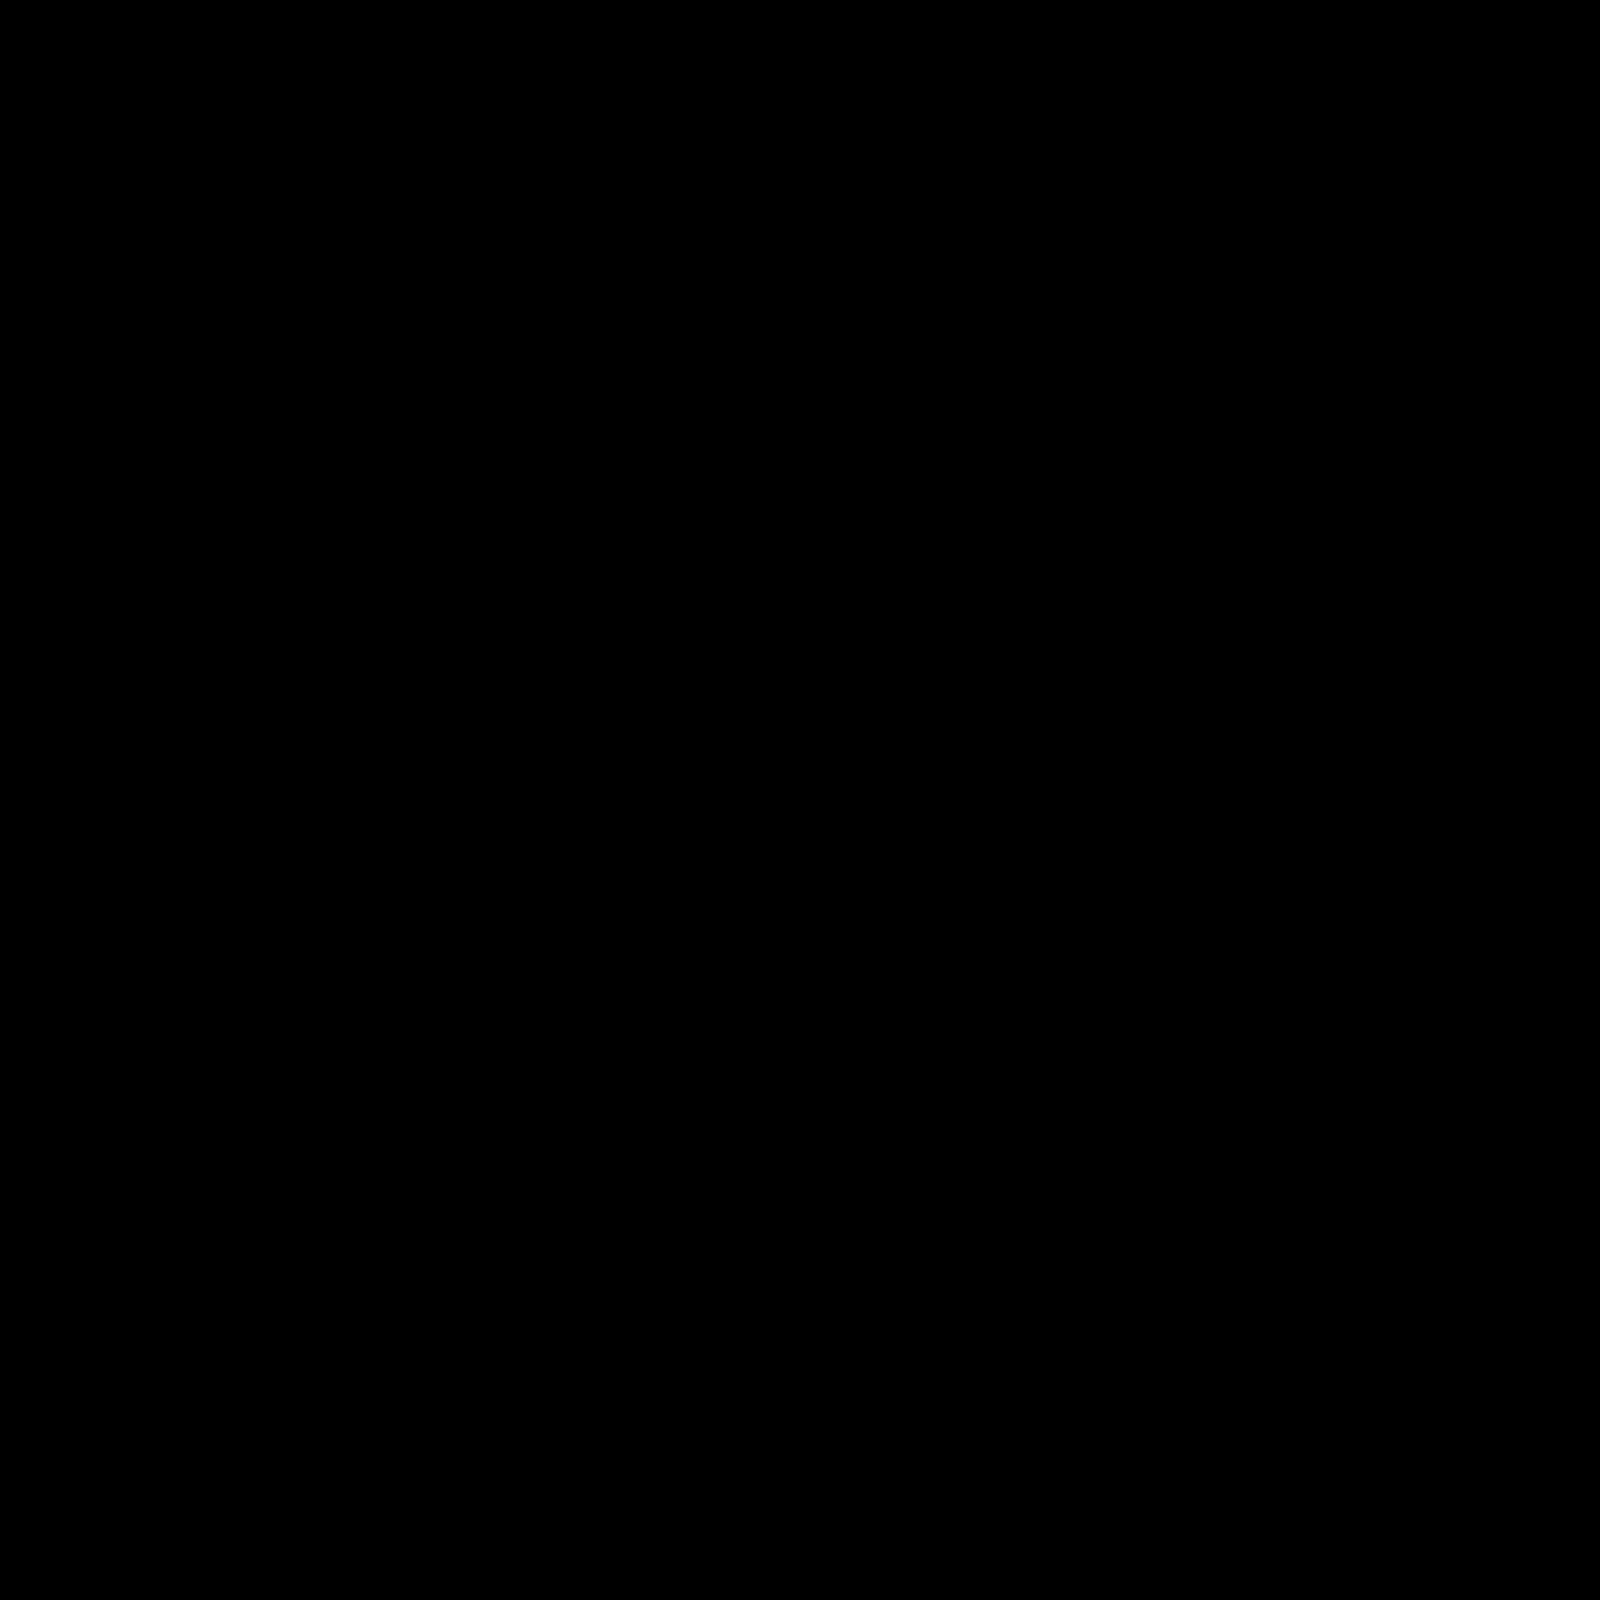 Kremlin icon